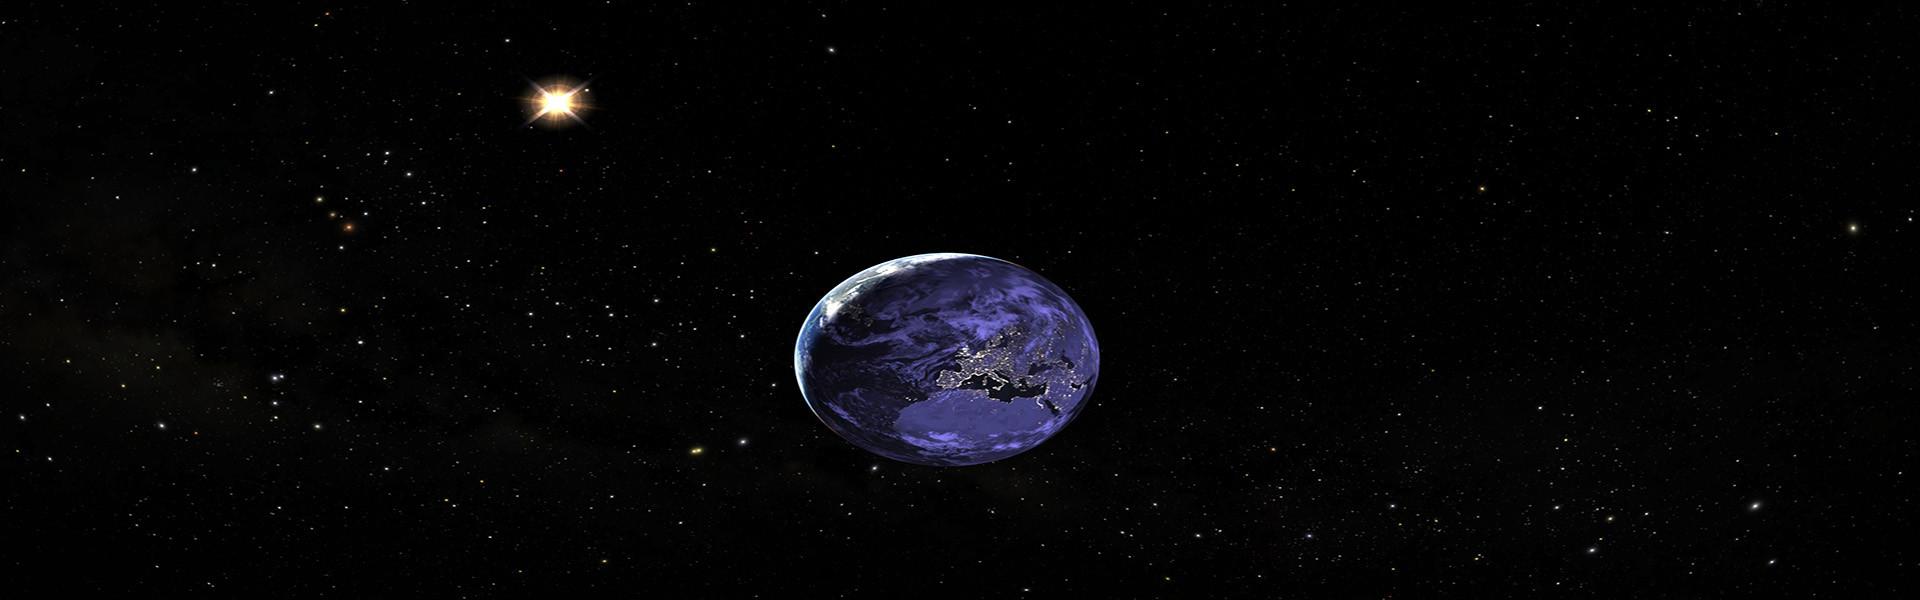 Floating Universe